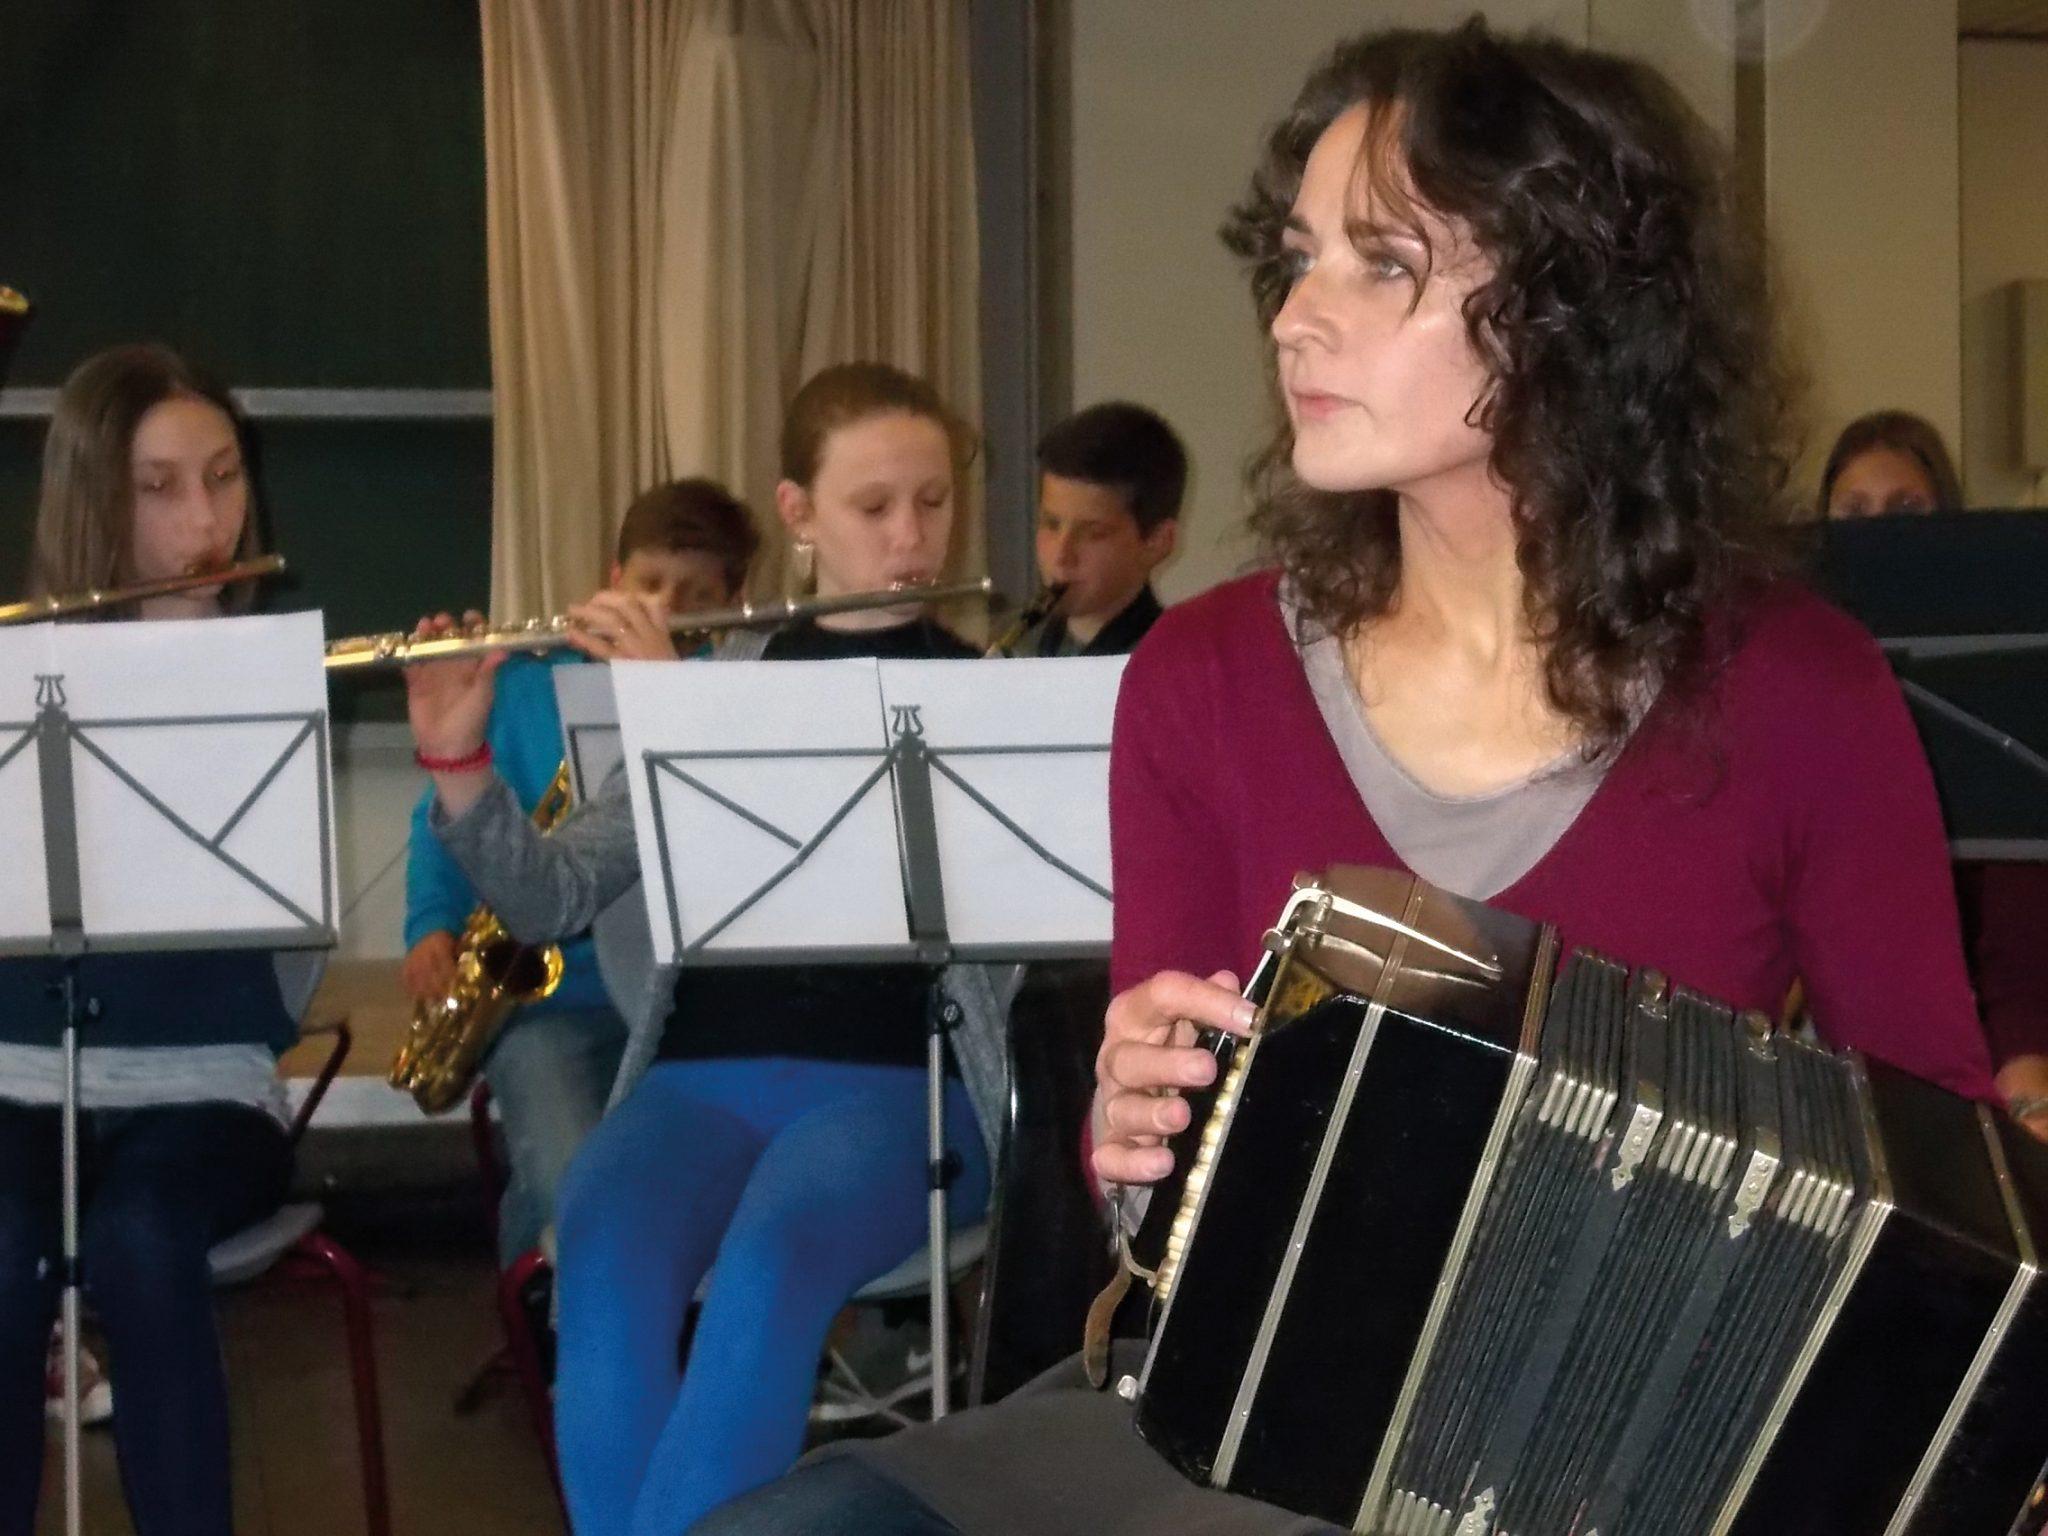 Milonga mit Livemusik in Staufen